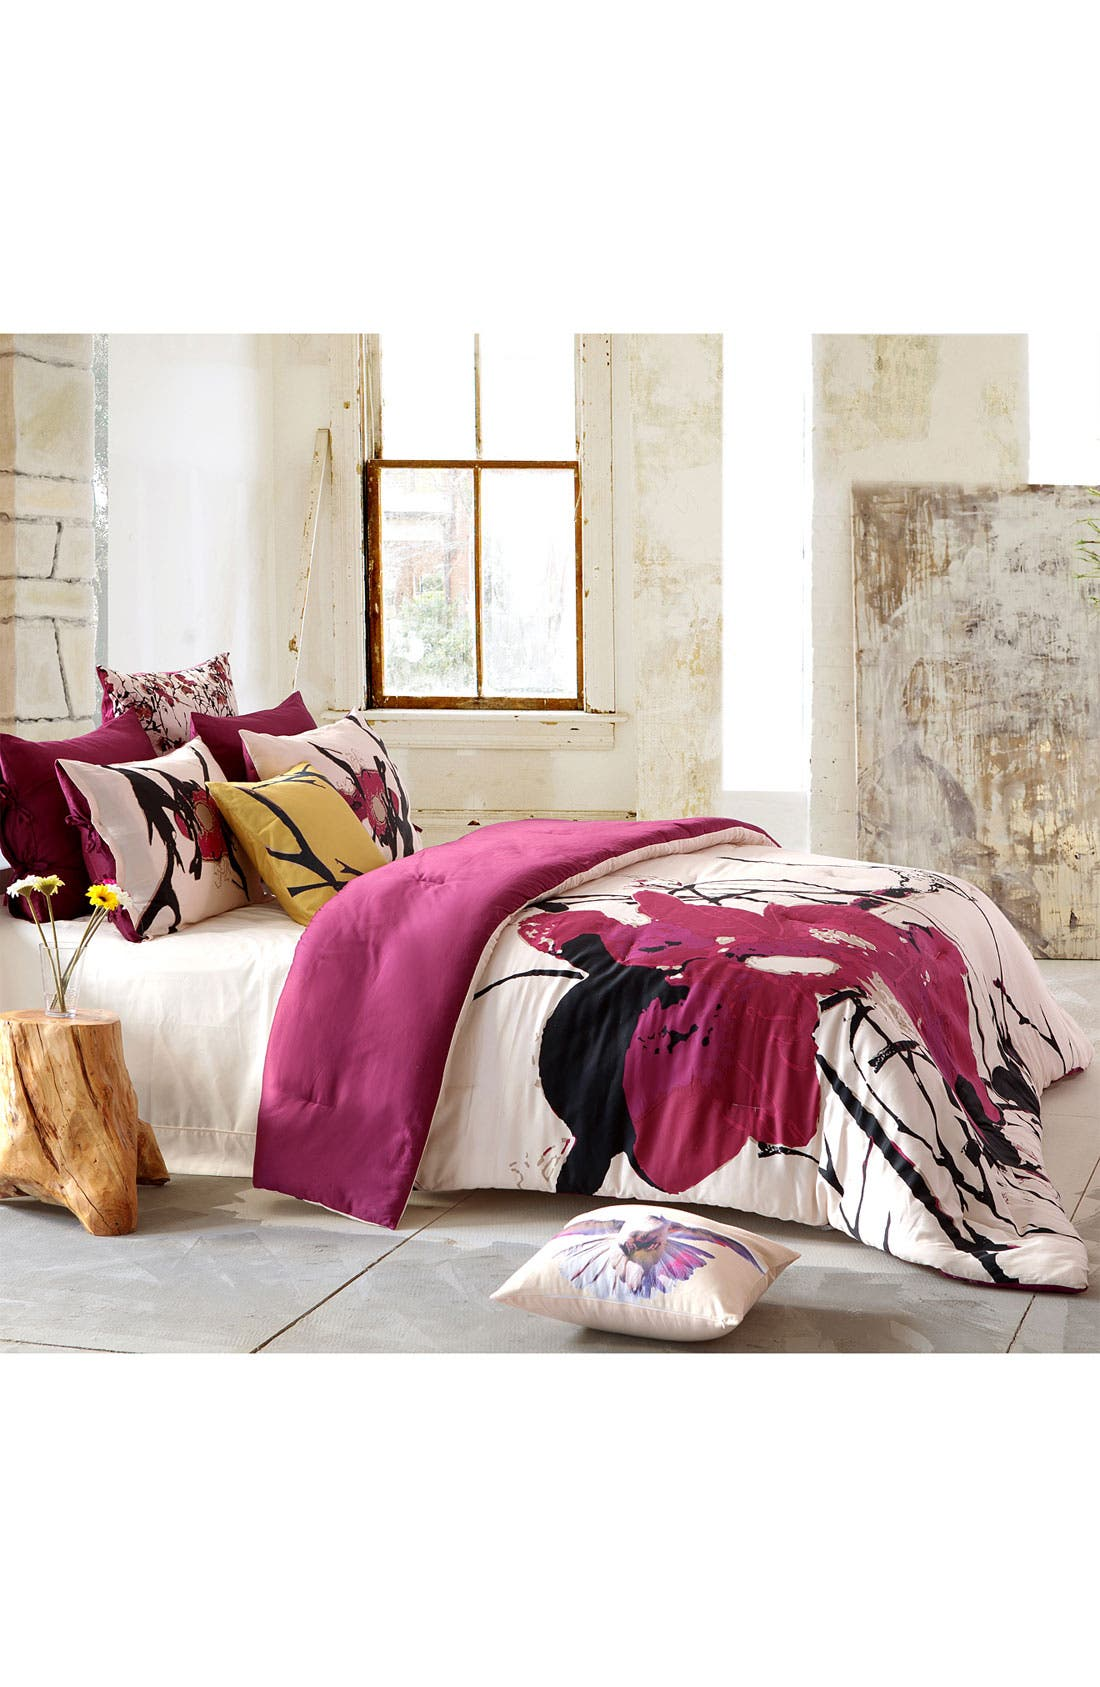 Alternate Image 2  - kensie 'Blossom' 300 Thread Count Duvet Cover Set (Online Only)